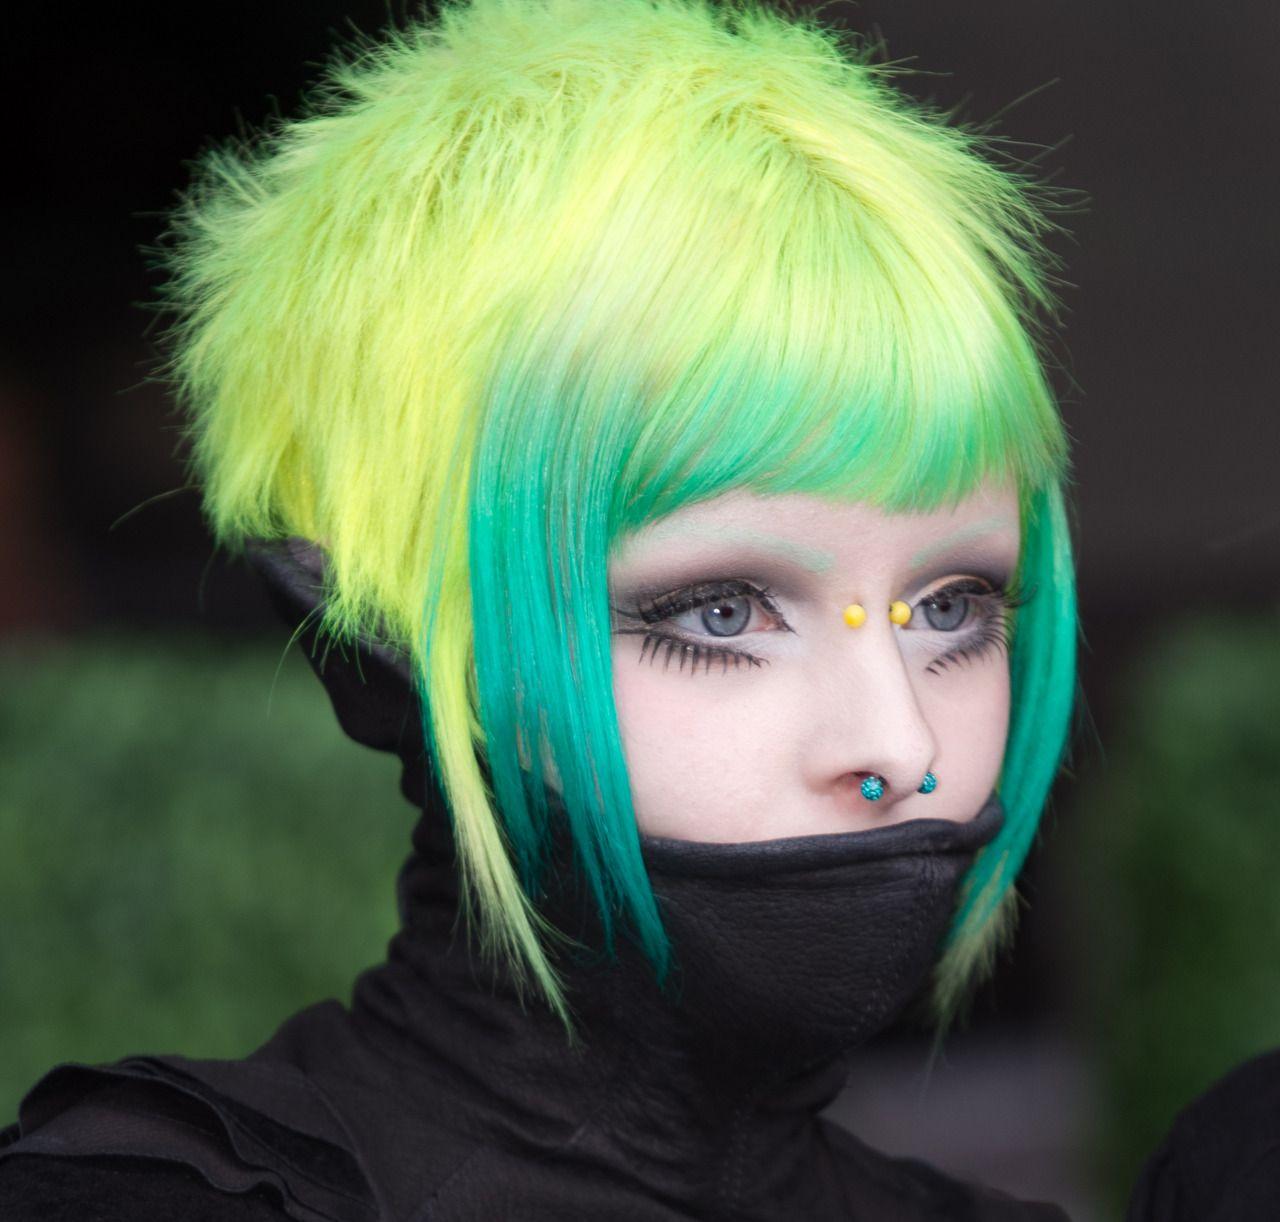 Ninja Alternative Girl Hairstyle Black Clothing Punk Girl Toxic